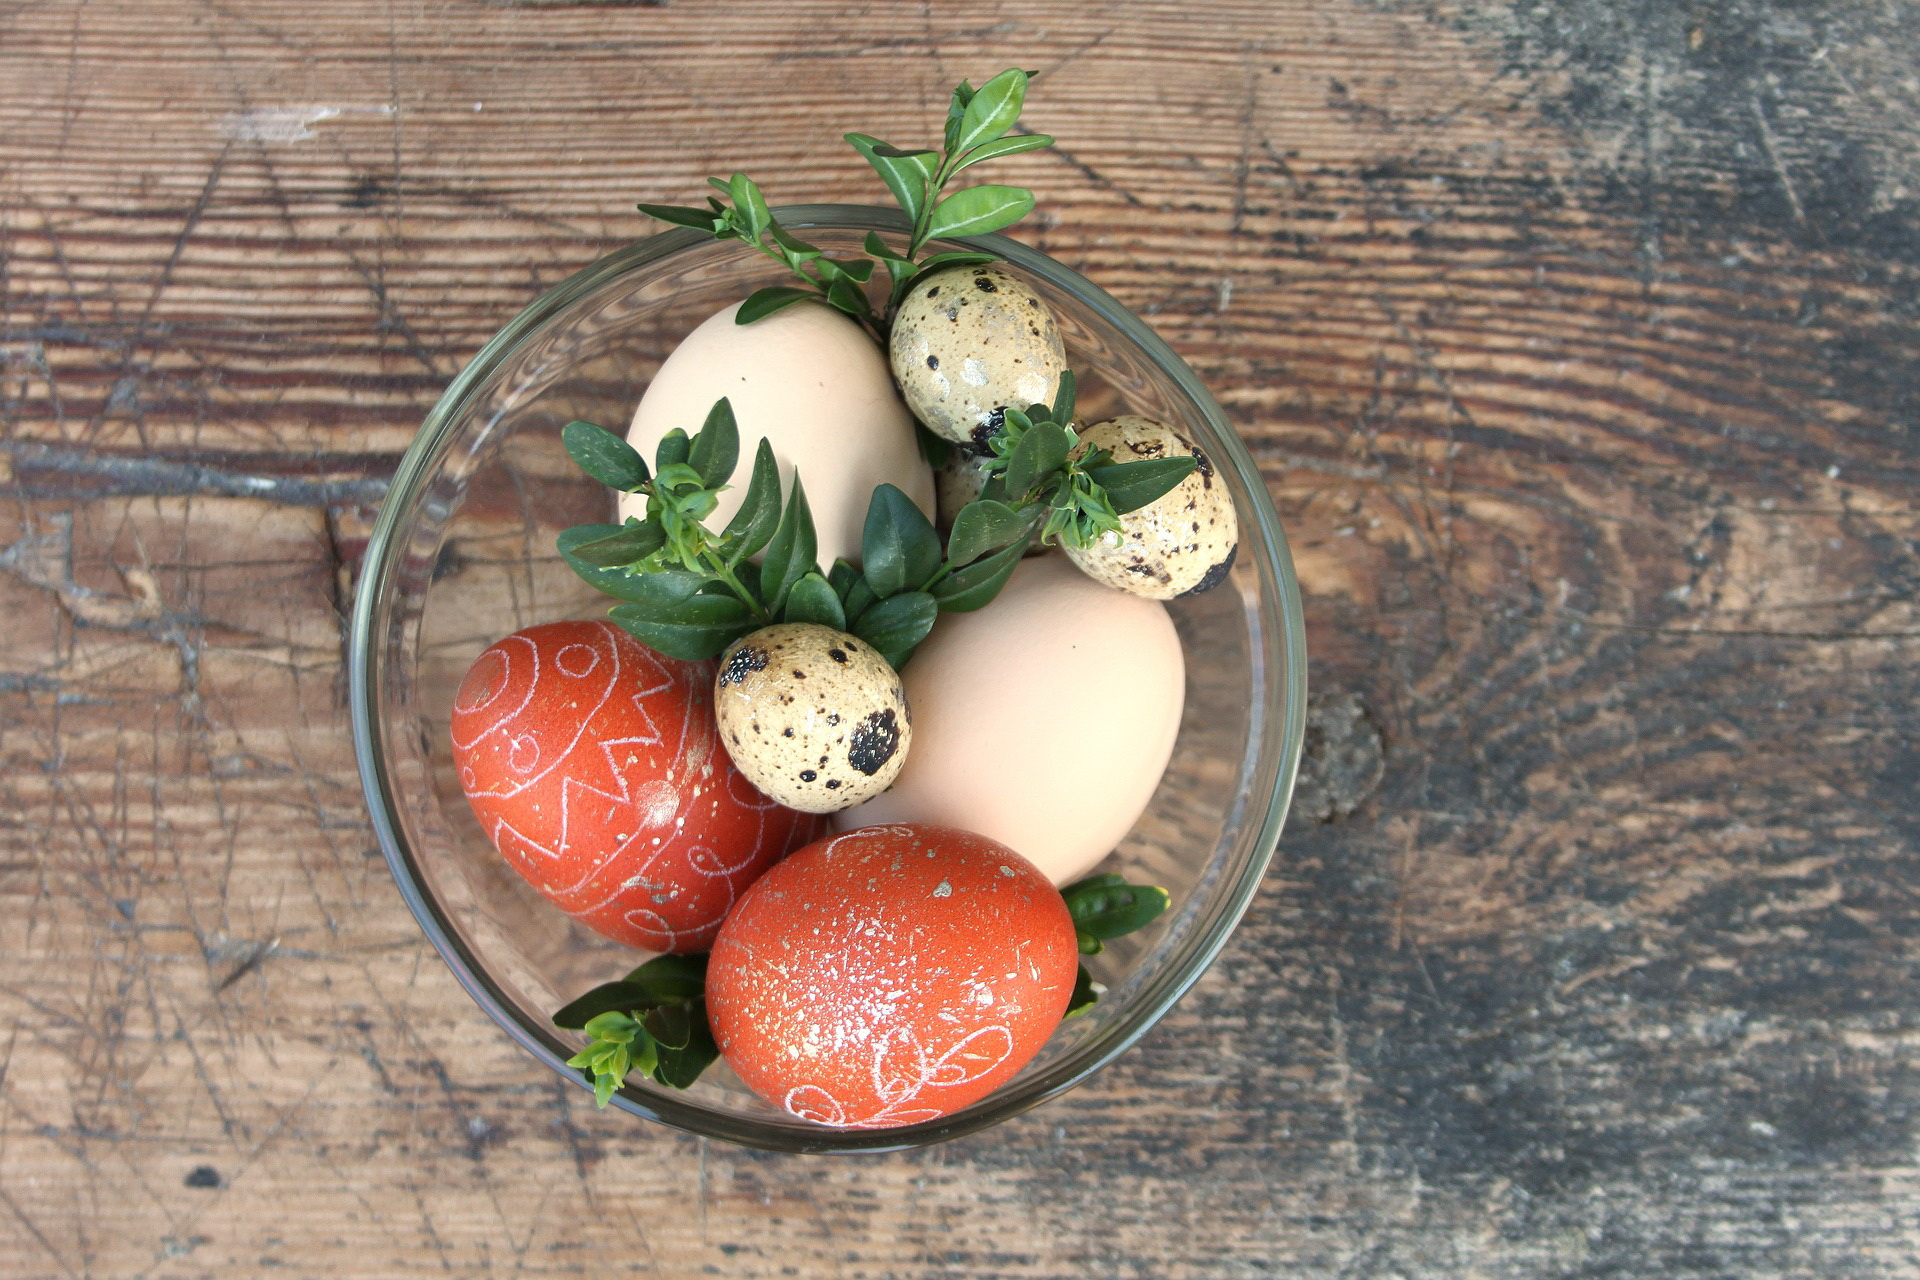 zagadki Wielkanoc